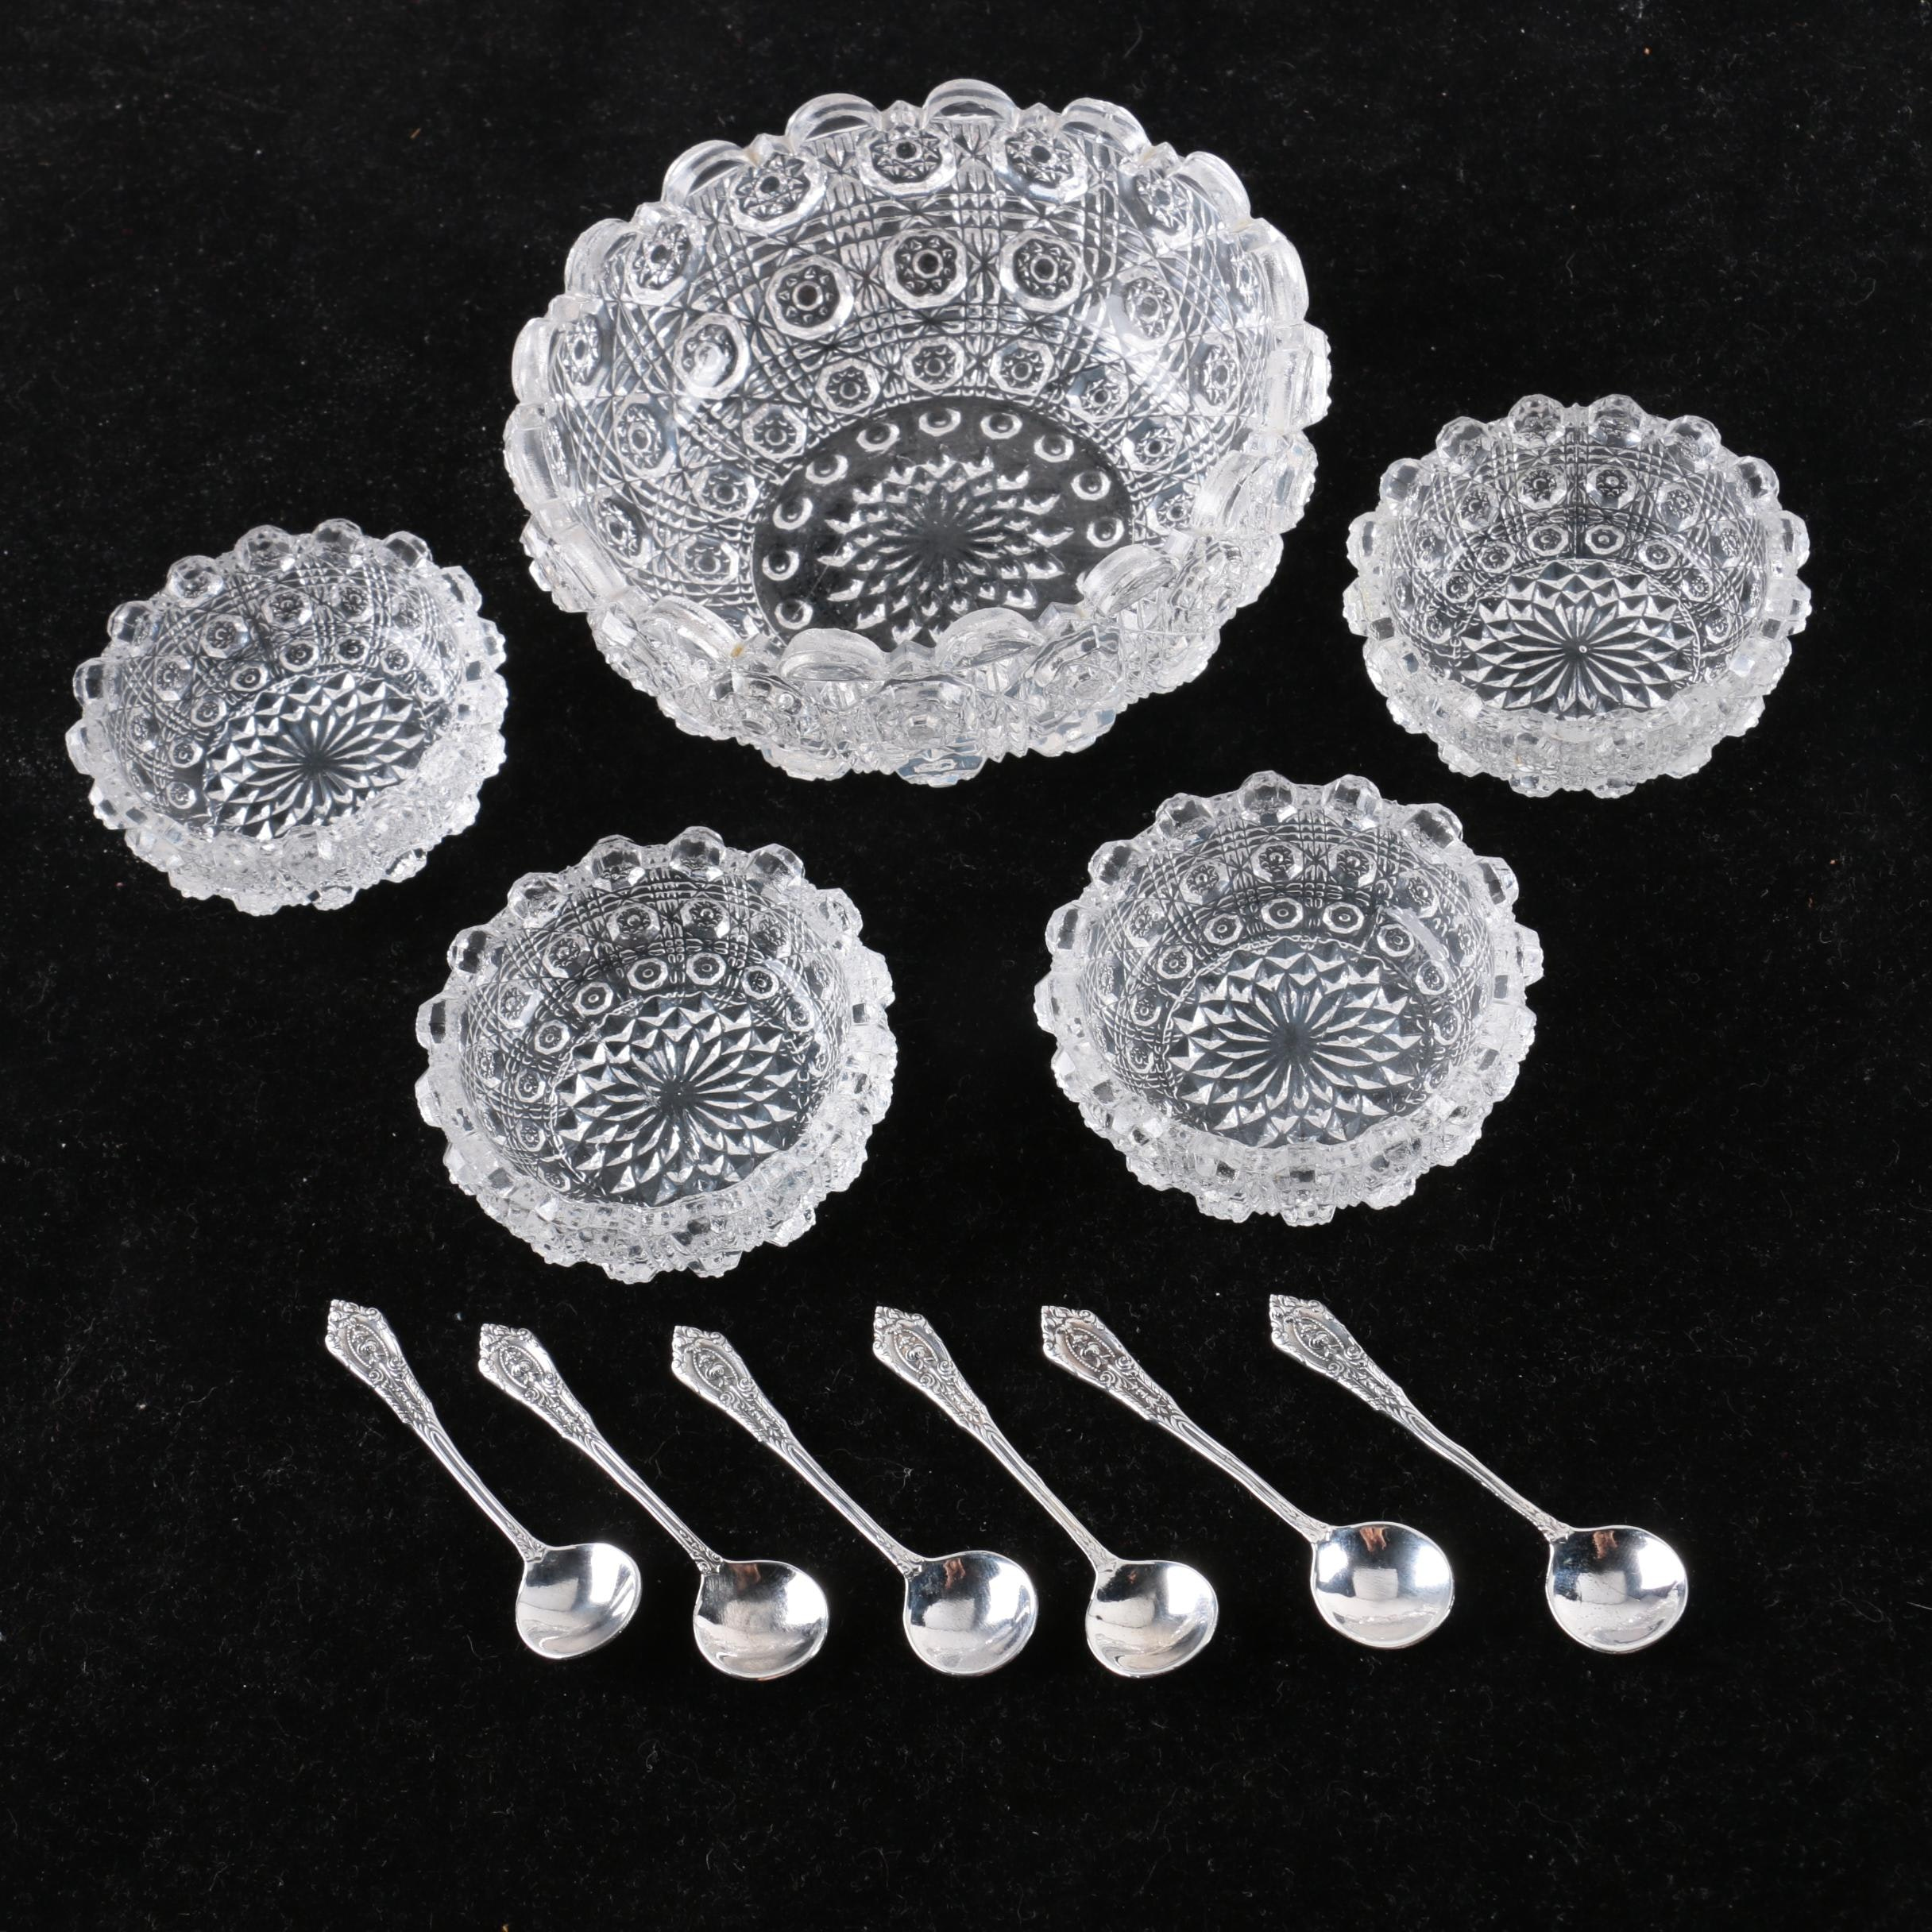 Sterling Silver Salt Spoons with Glass Salt Cellars